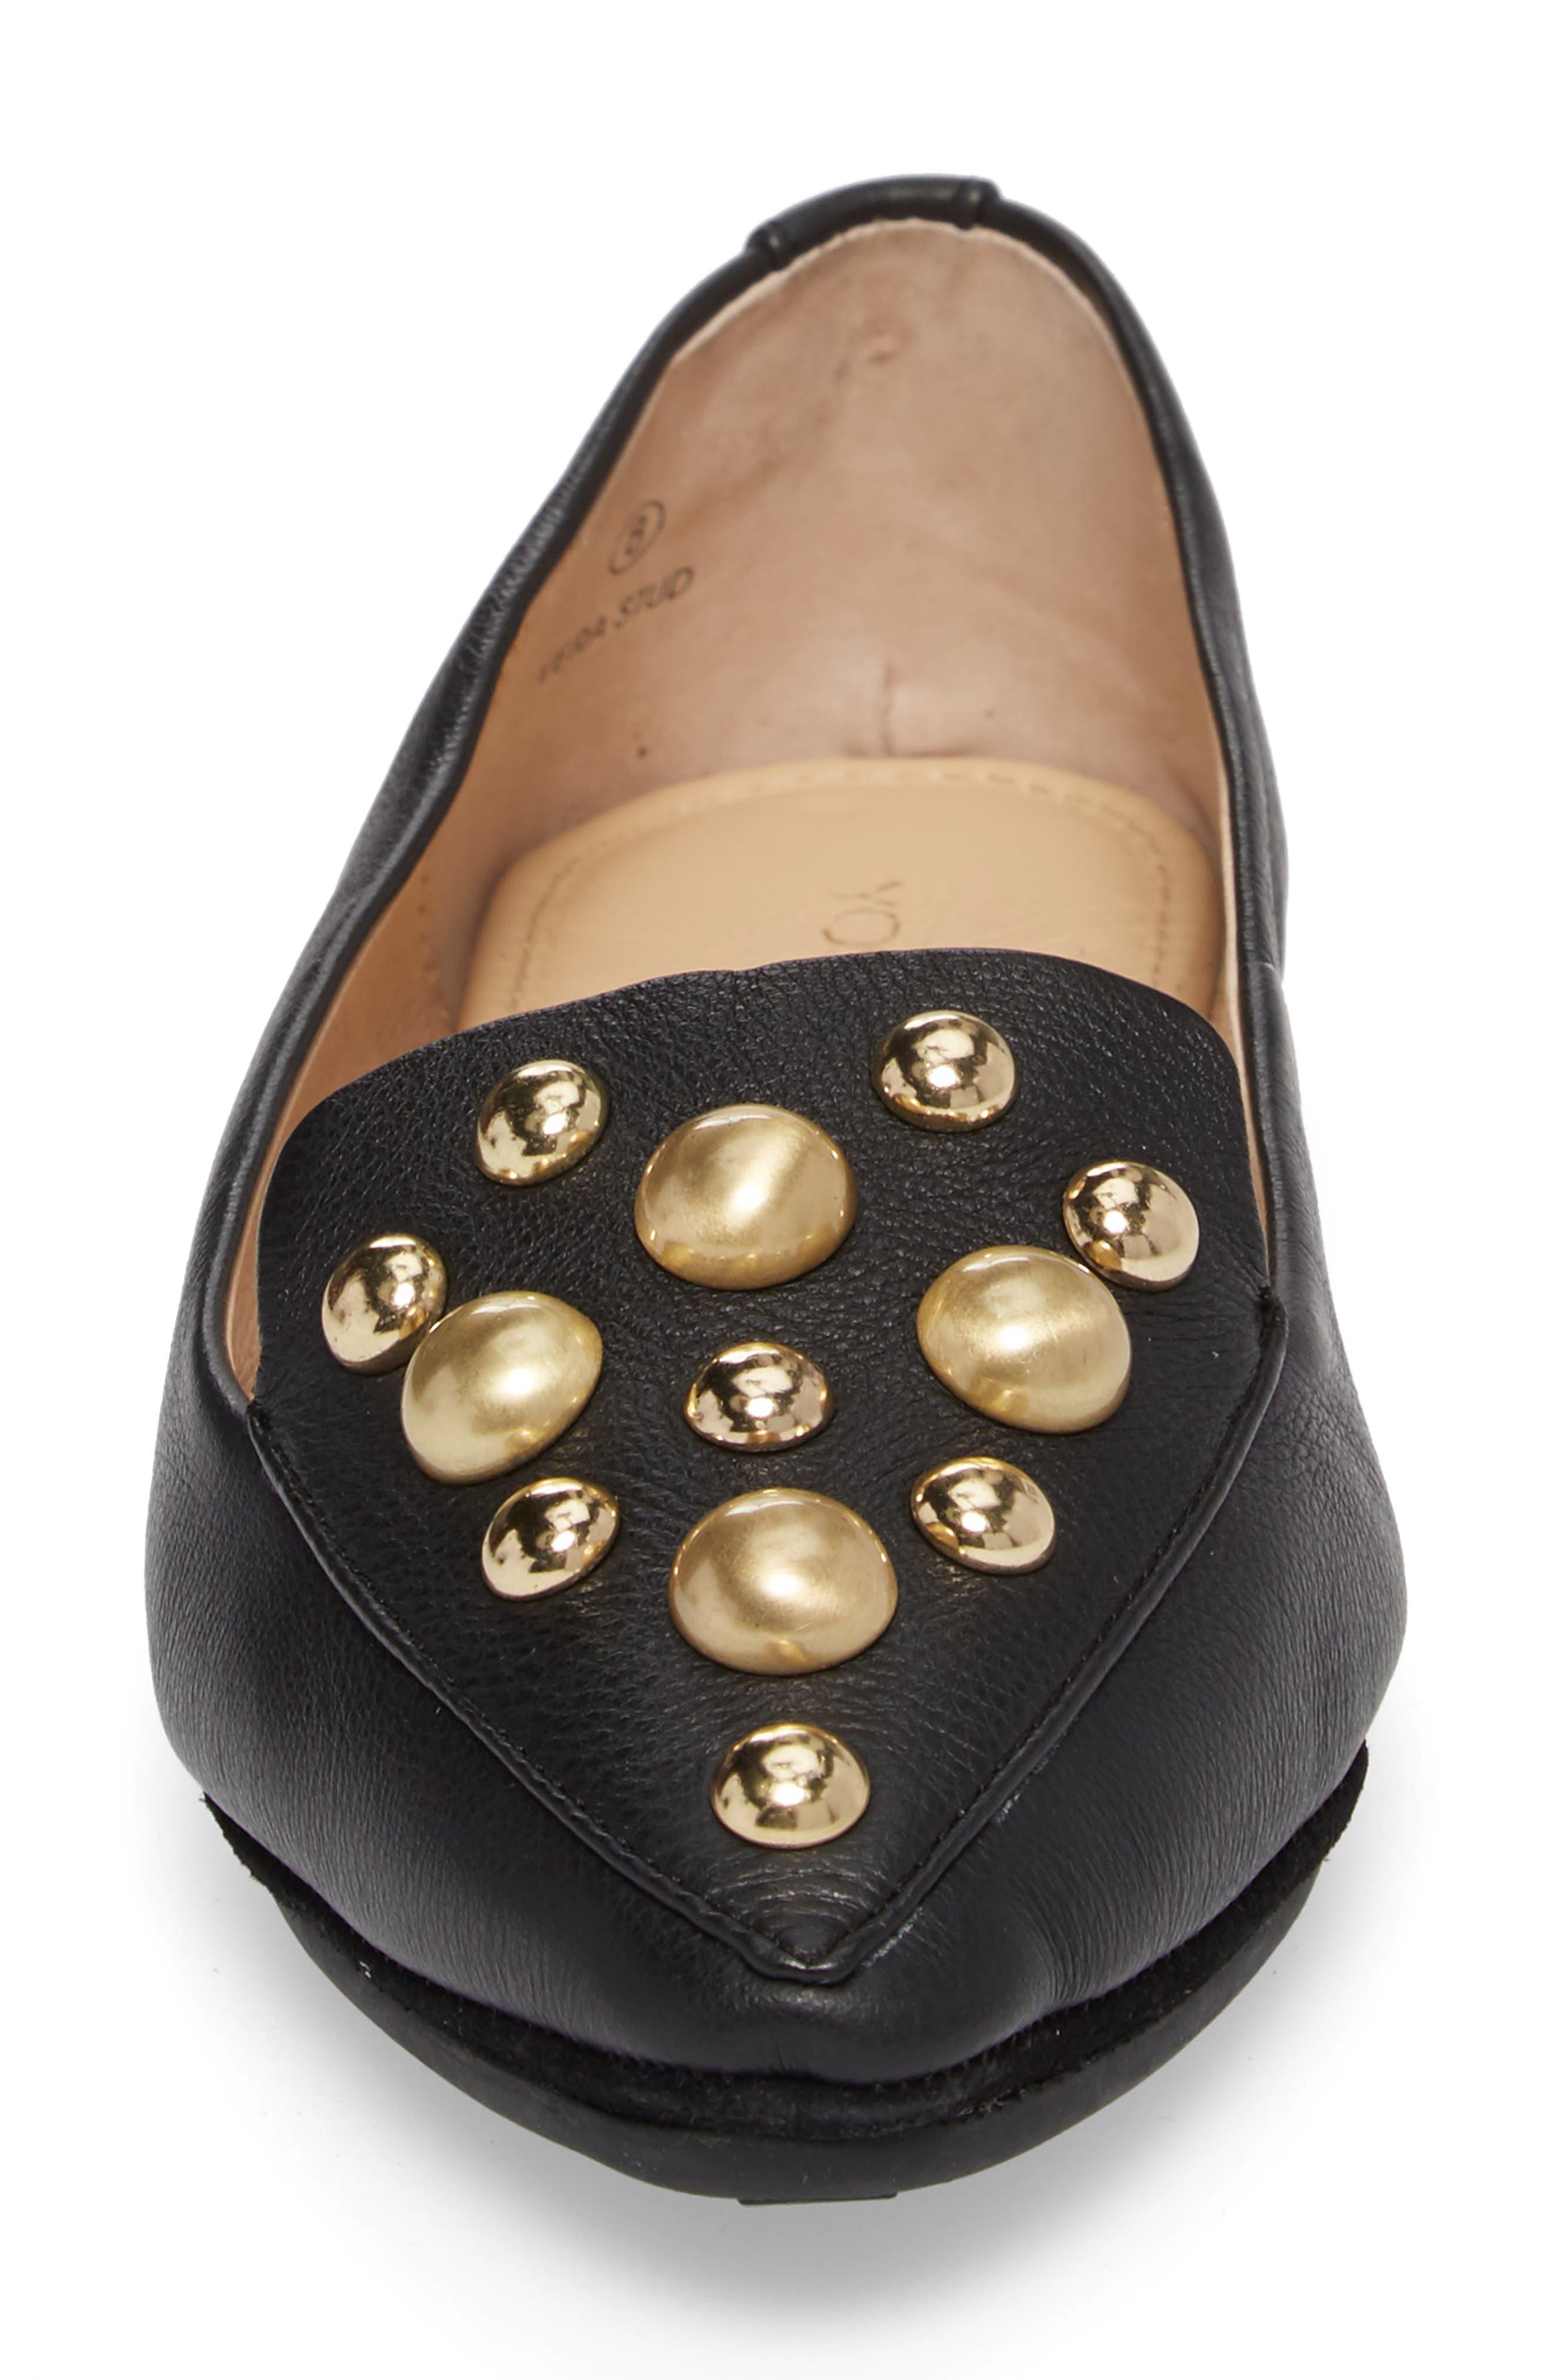 Vera Studded Loafer,                             Alternate thumbnail 4, color,                             Black/ Black Leather